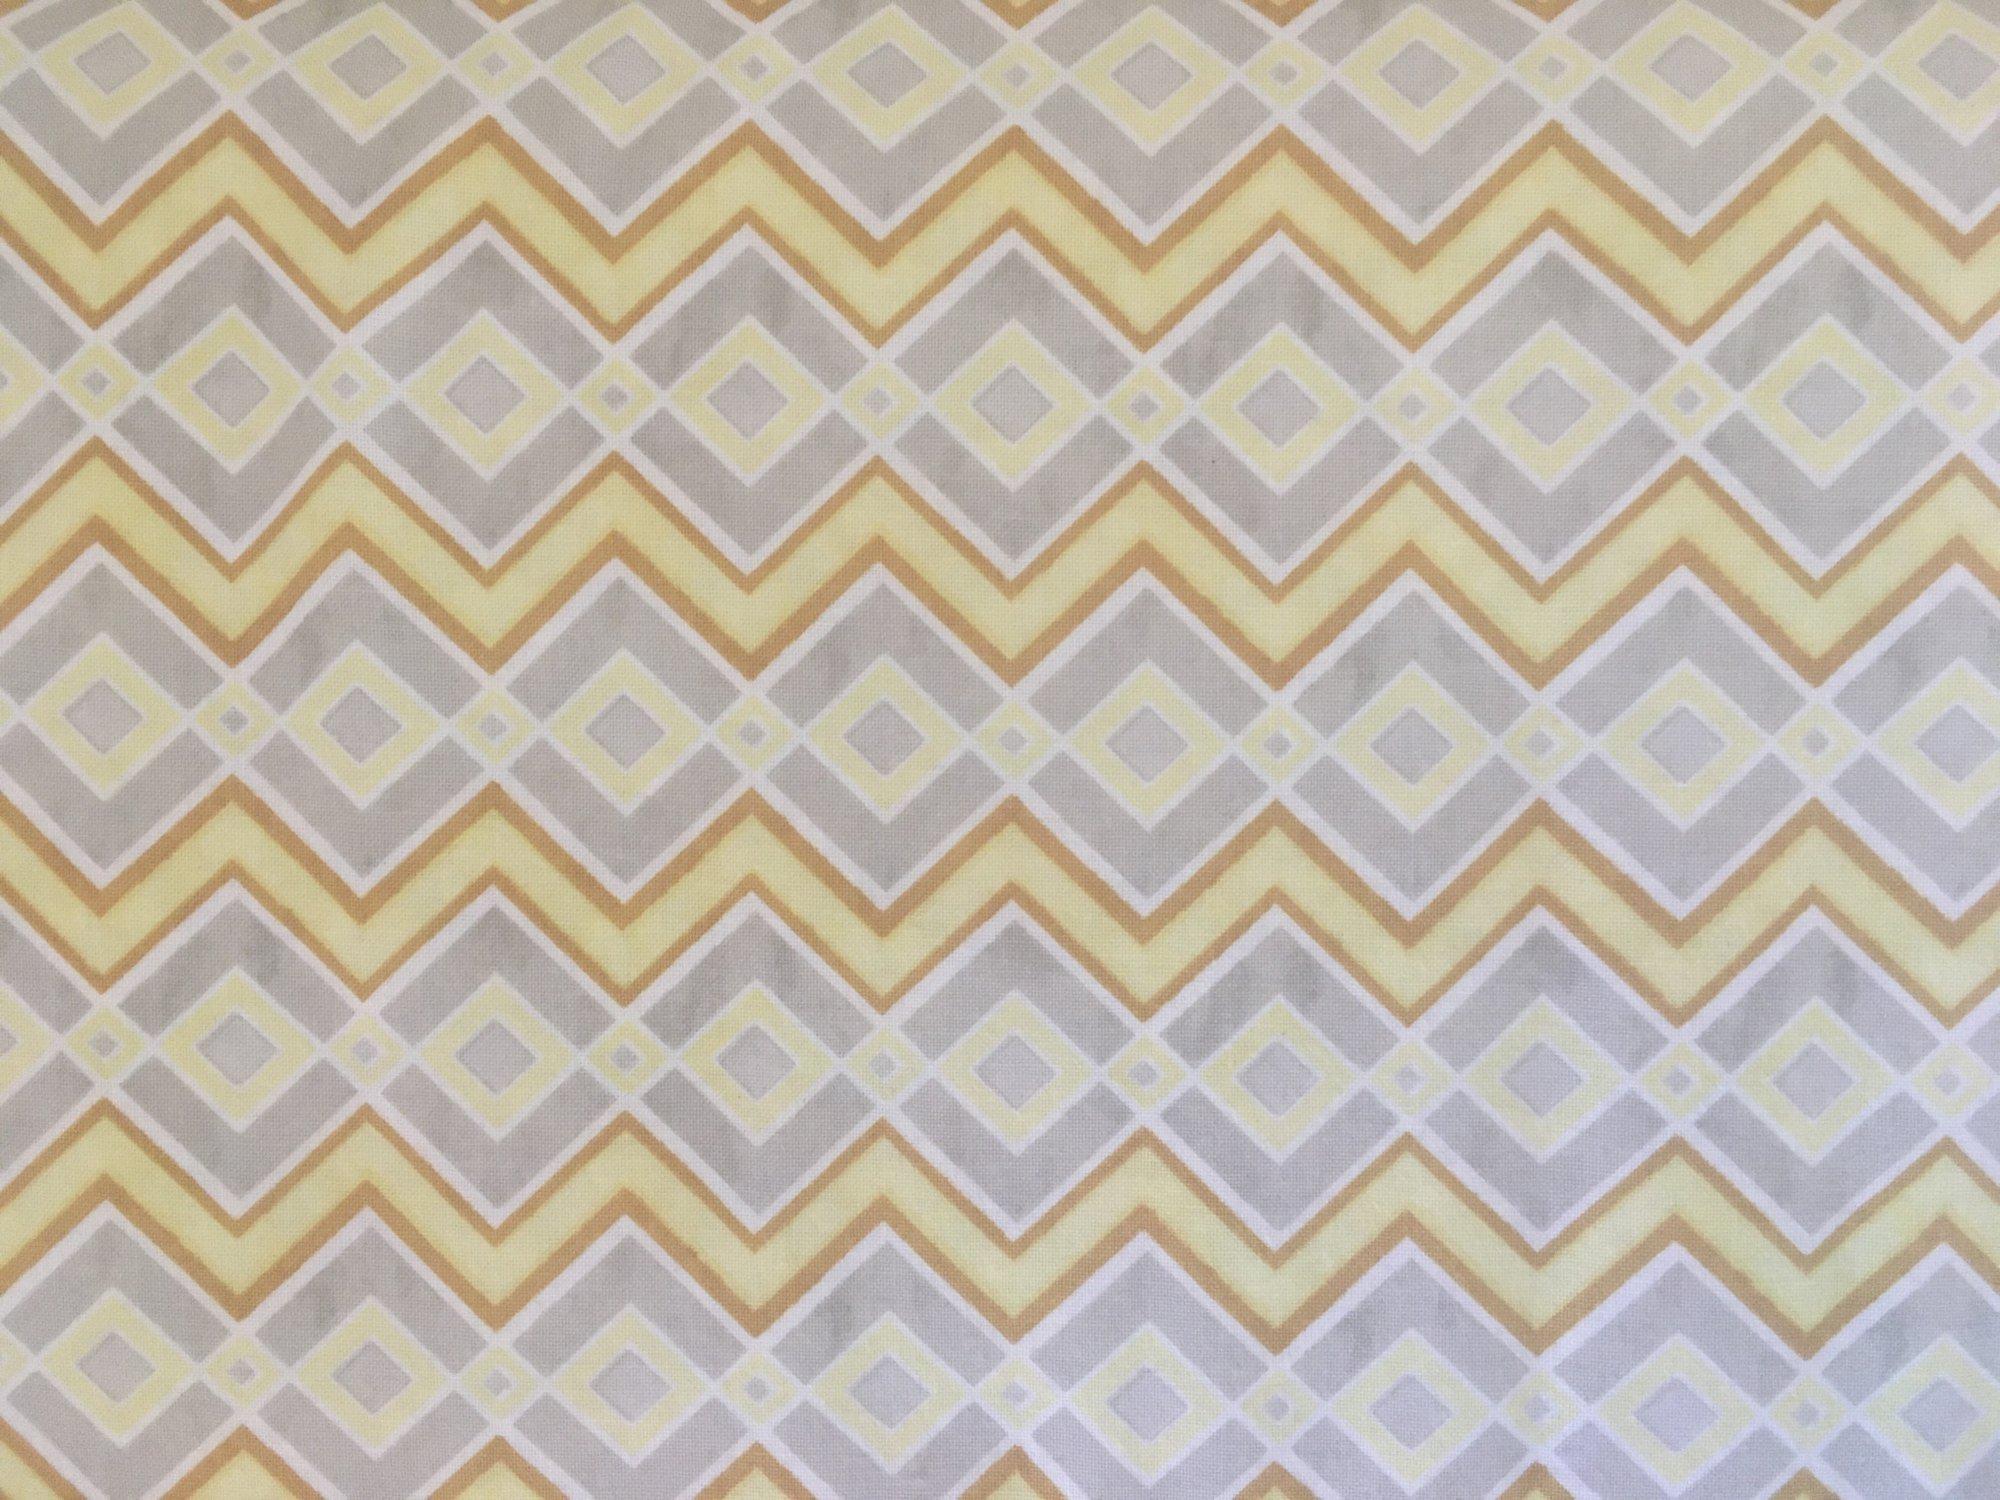 FELICITY YELLOW/GOLD/GREY CHEVRON 42380195 Wilmington Prints